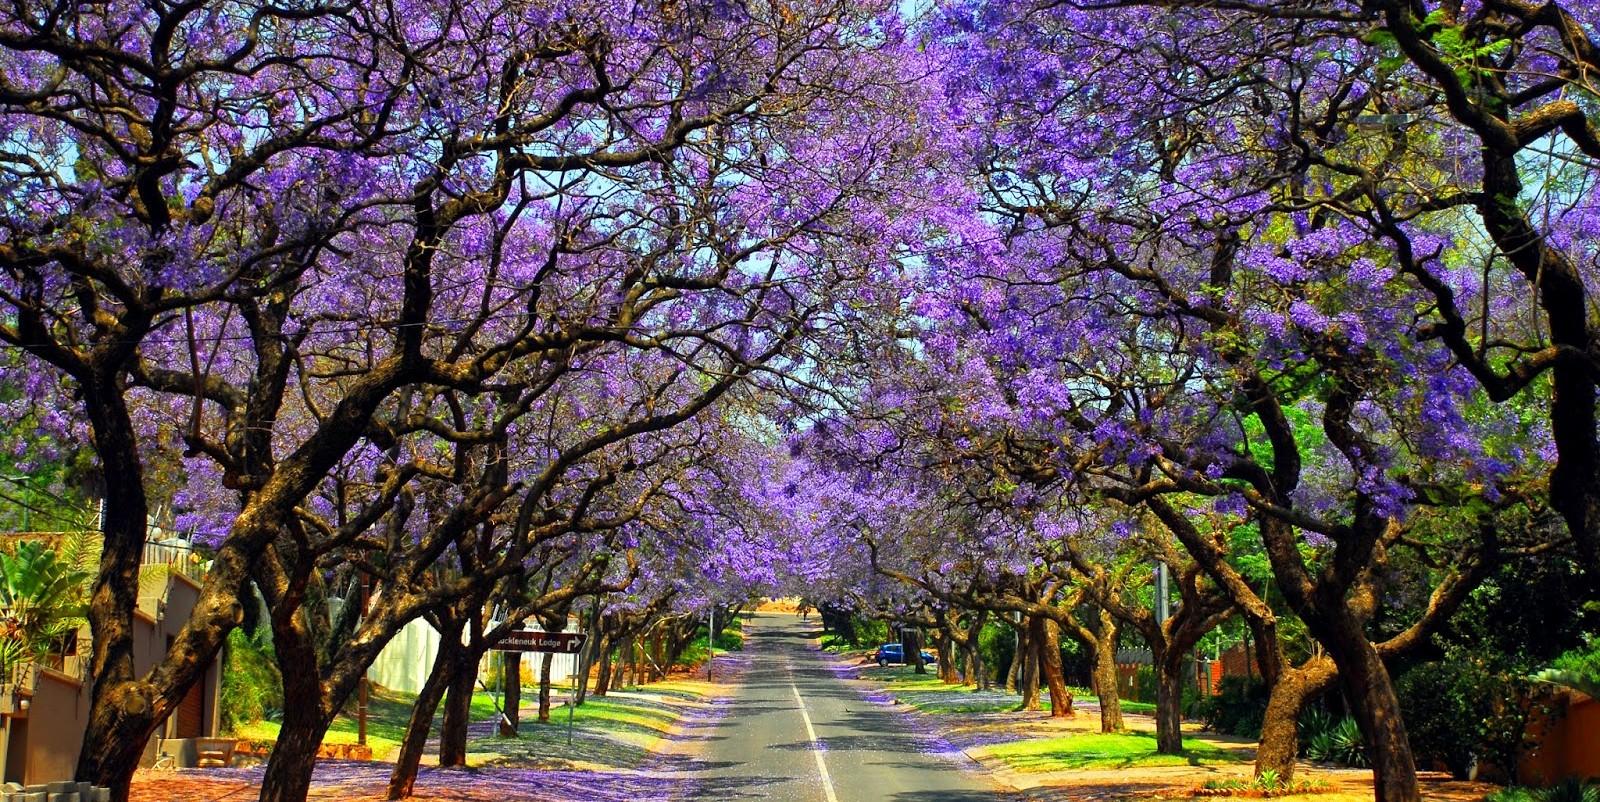 Du lịch Nam Phi: Johannesburg – Pretoria – Sun City – Cape Town 8 ngày